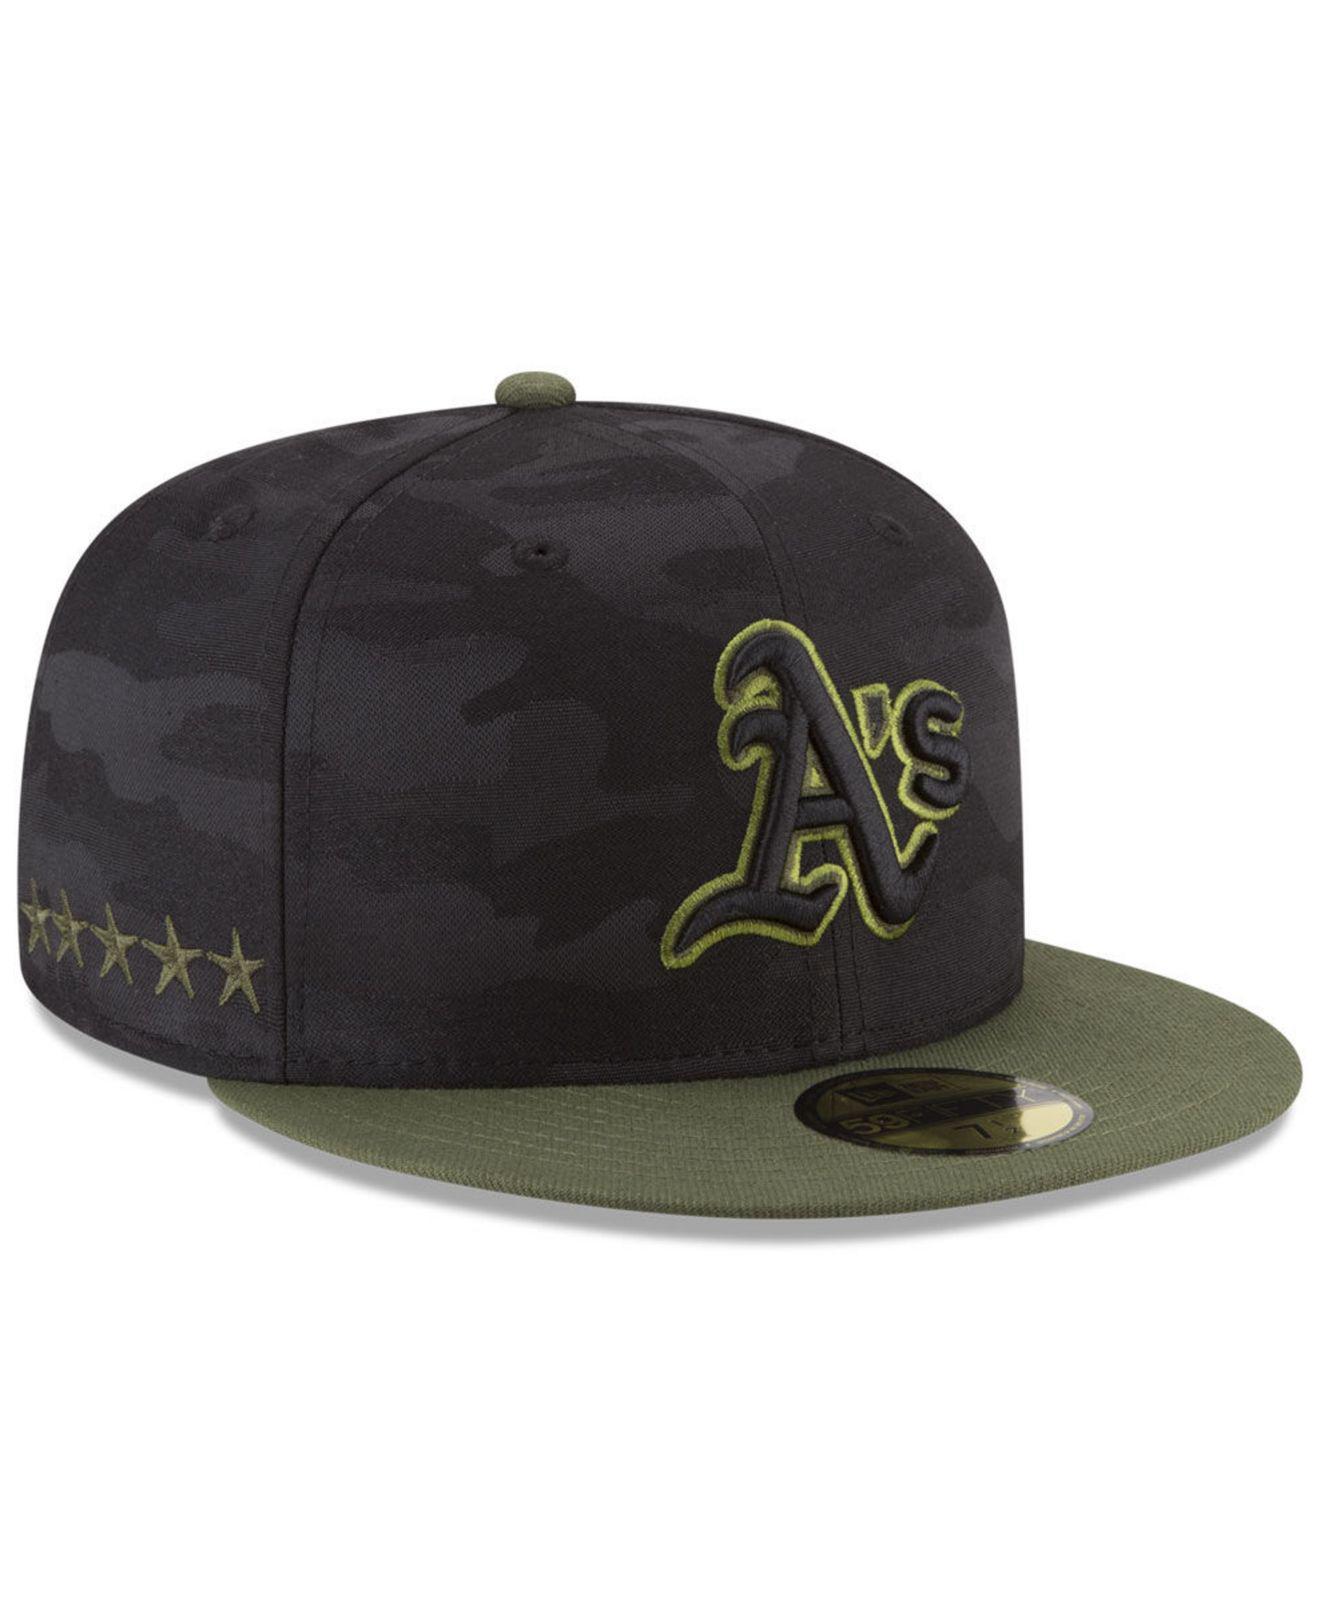 best website 4e8b1 64b22 KTZ. Men s Black Oakland Athletics Memorial Day 59fifty Fitted Cap